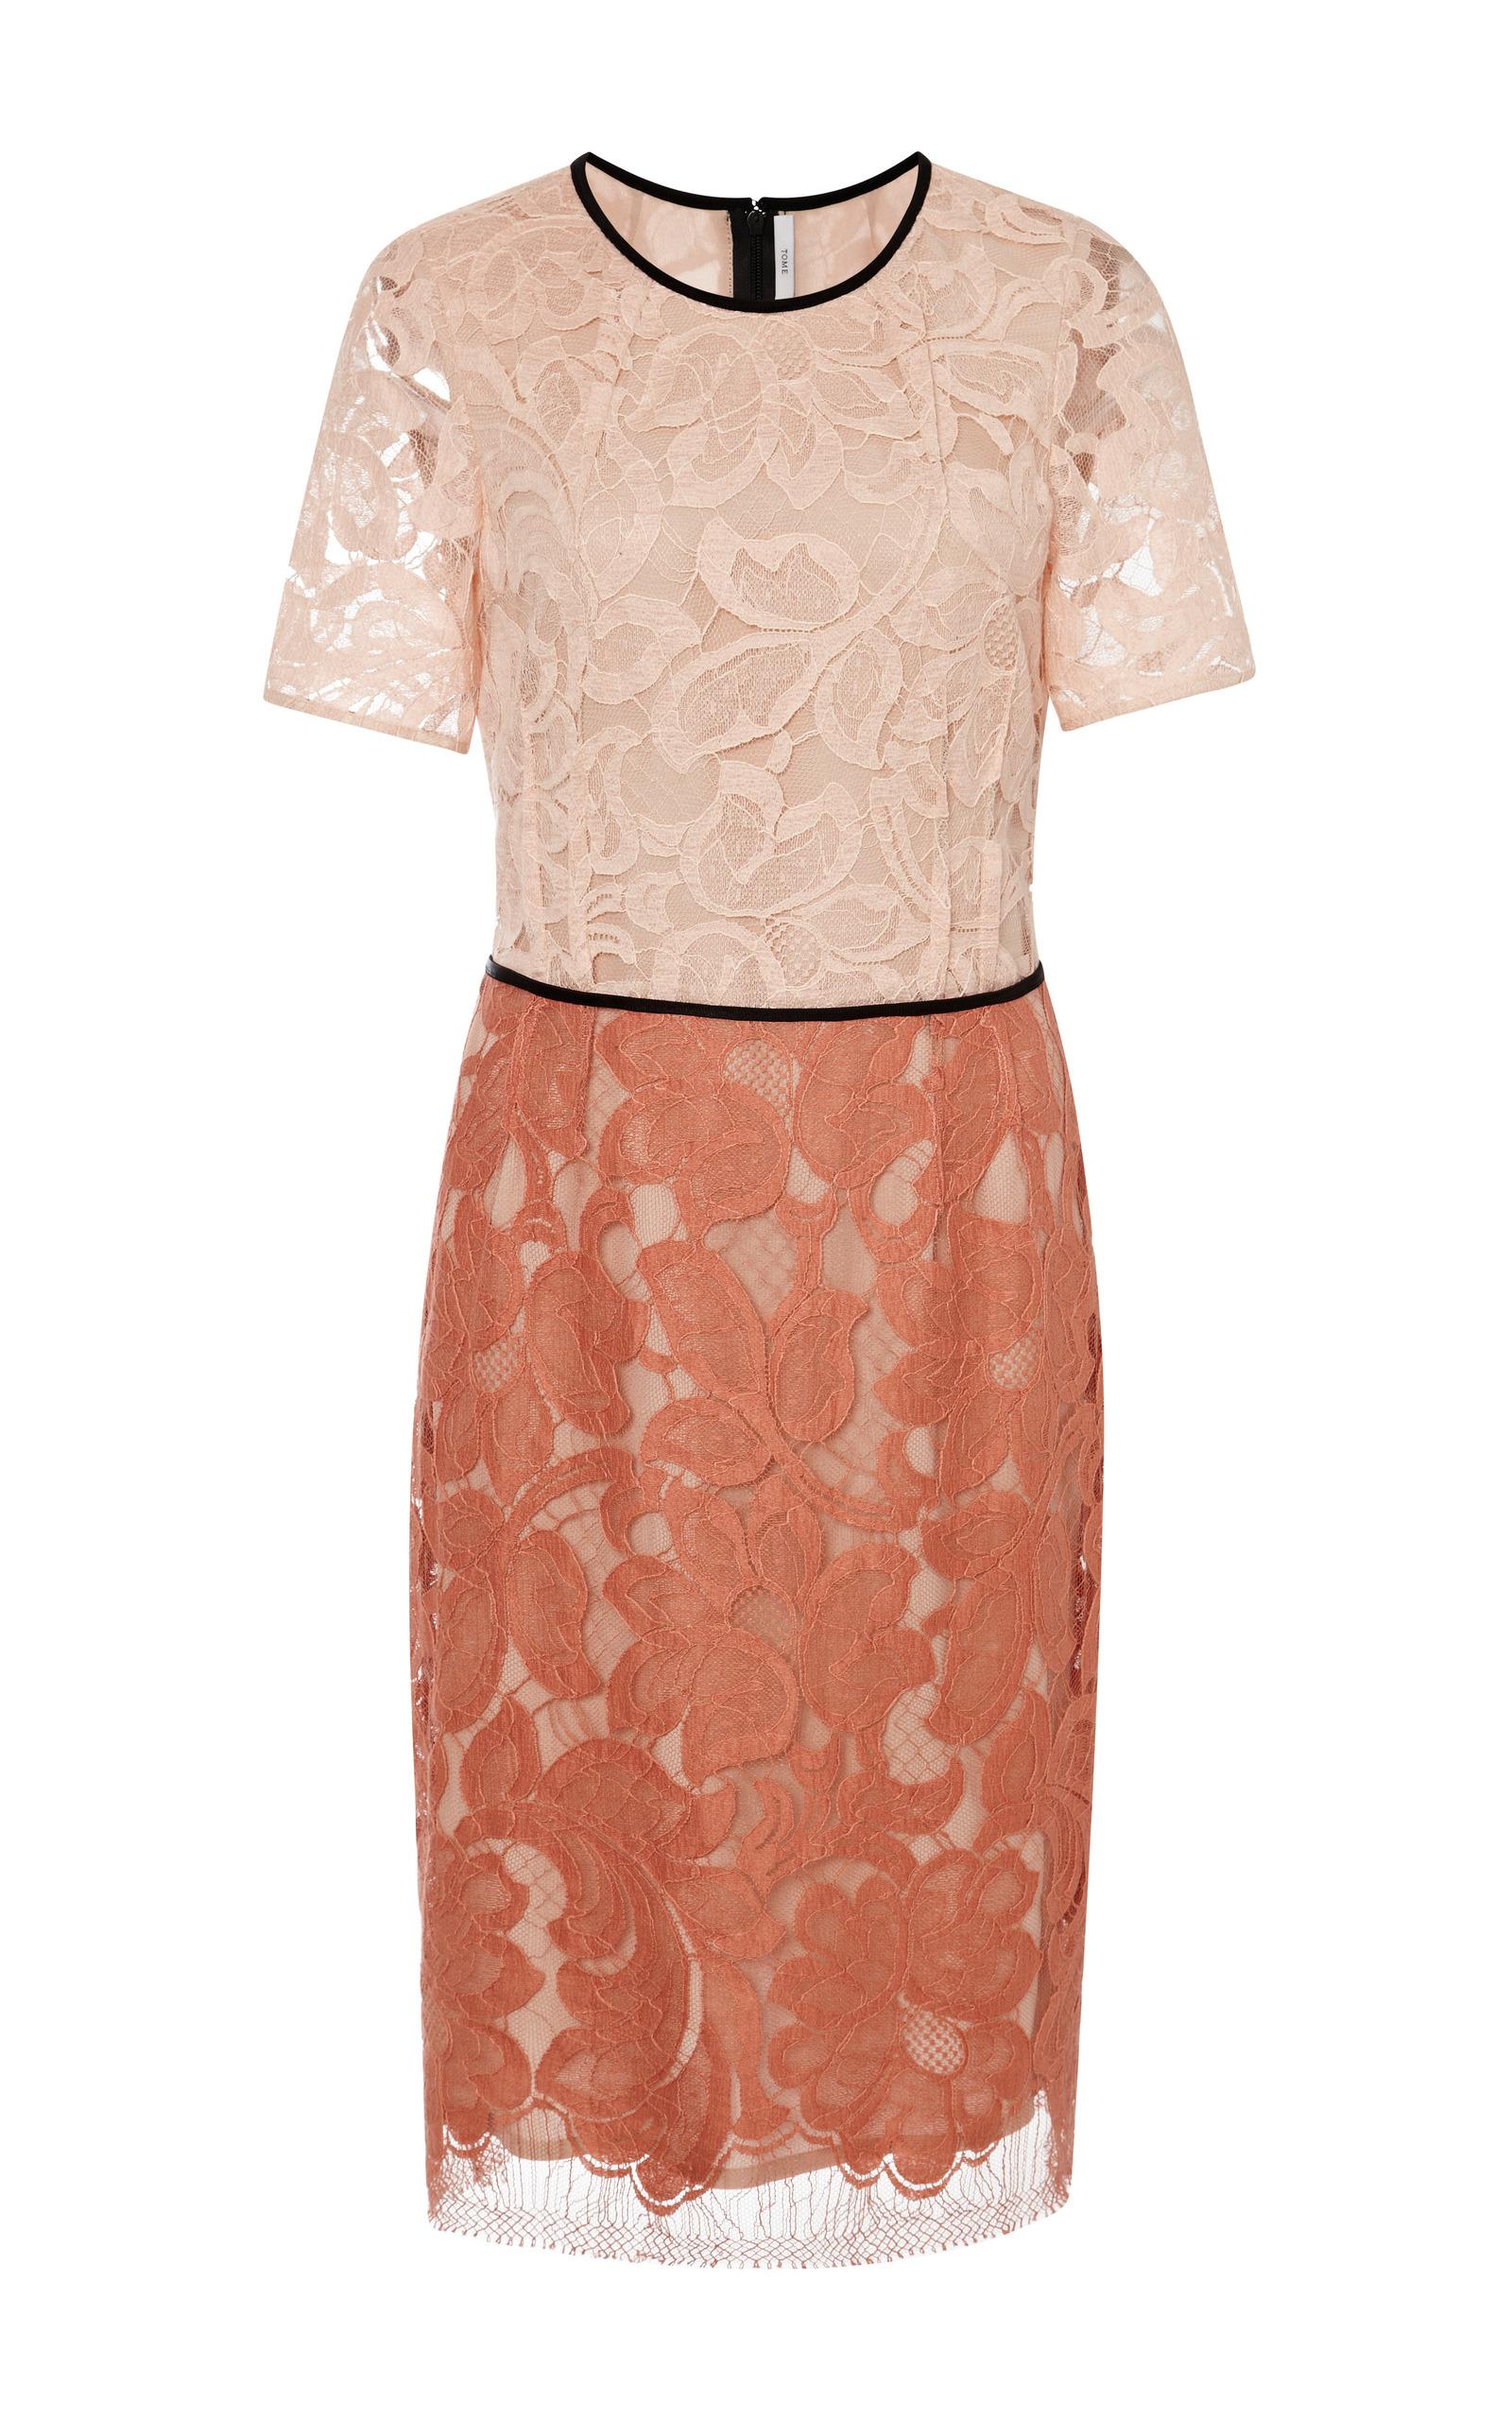 huge selection of 46c09 c4c83 Lace Double Dart Dress